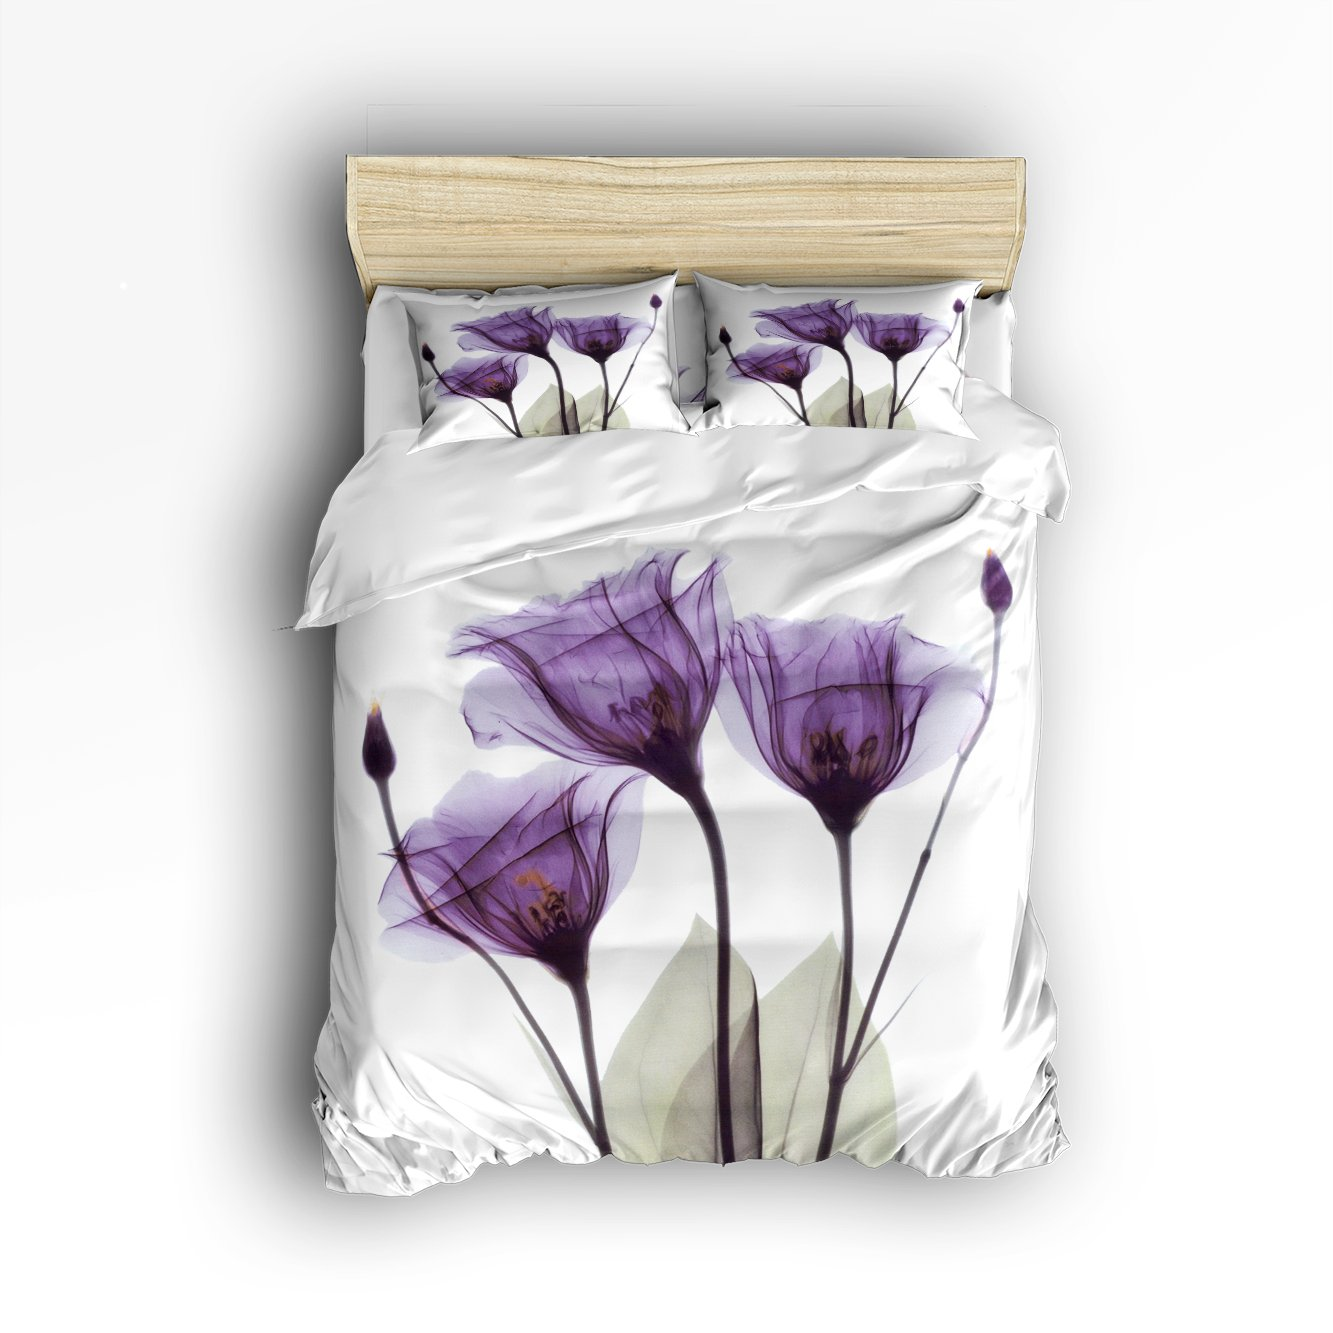 Libaoge 4 Piece Bed Sheets Set, Purple Flower ''Lavender Hope'', 1 Flat Sheet 1 Duvet Cover and 2 Pillow Cases